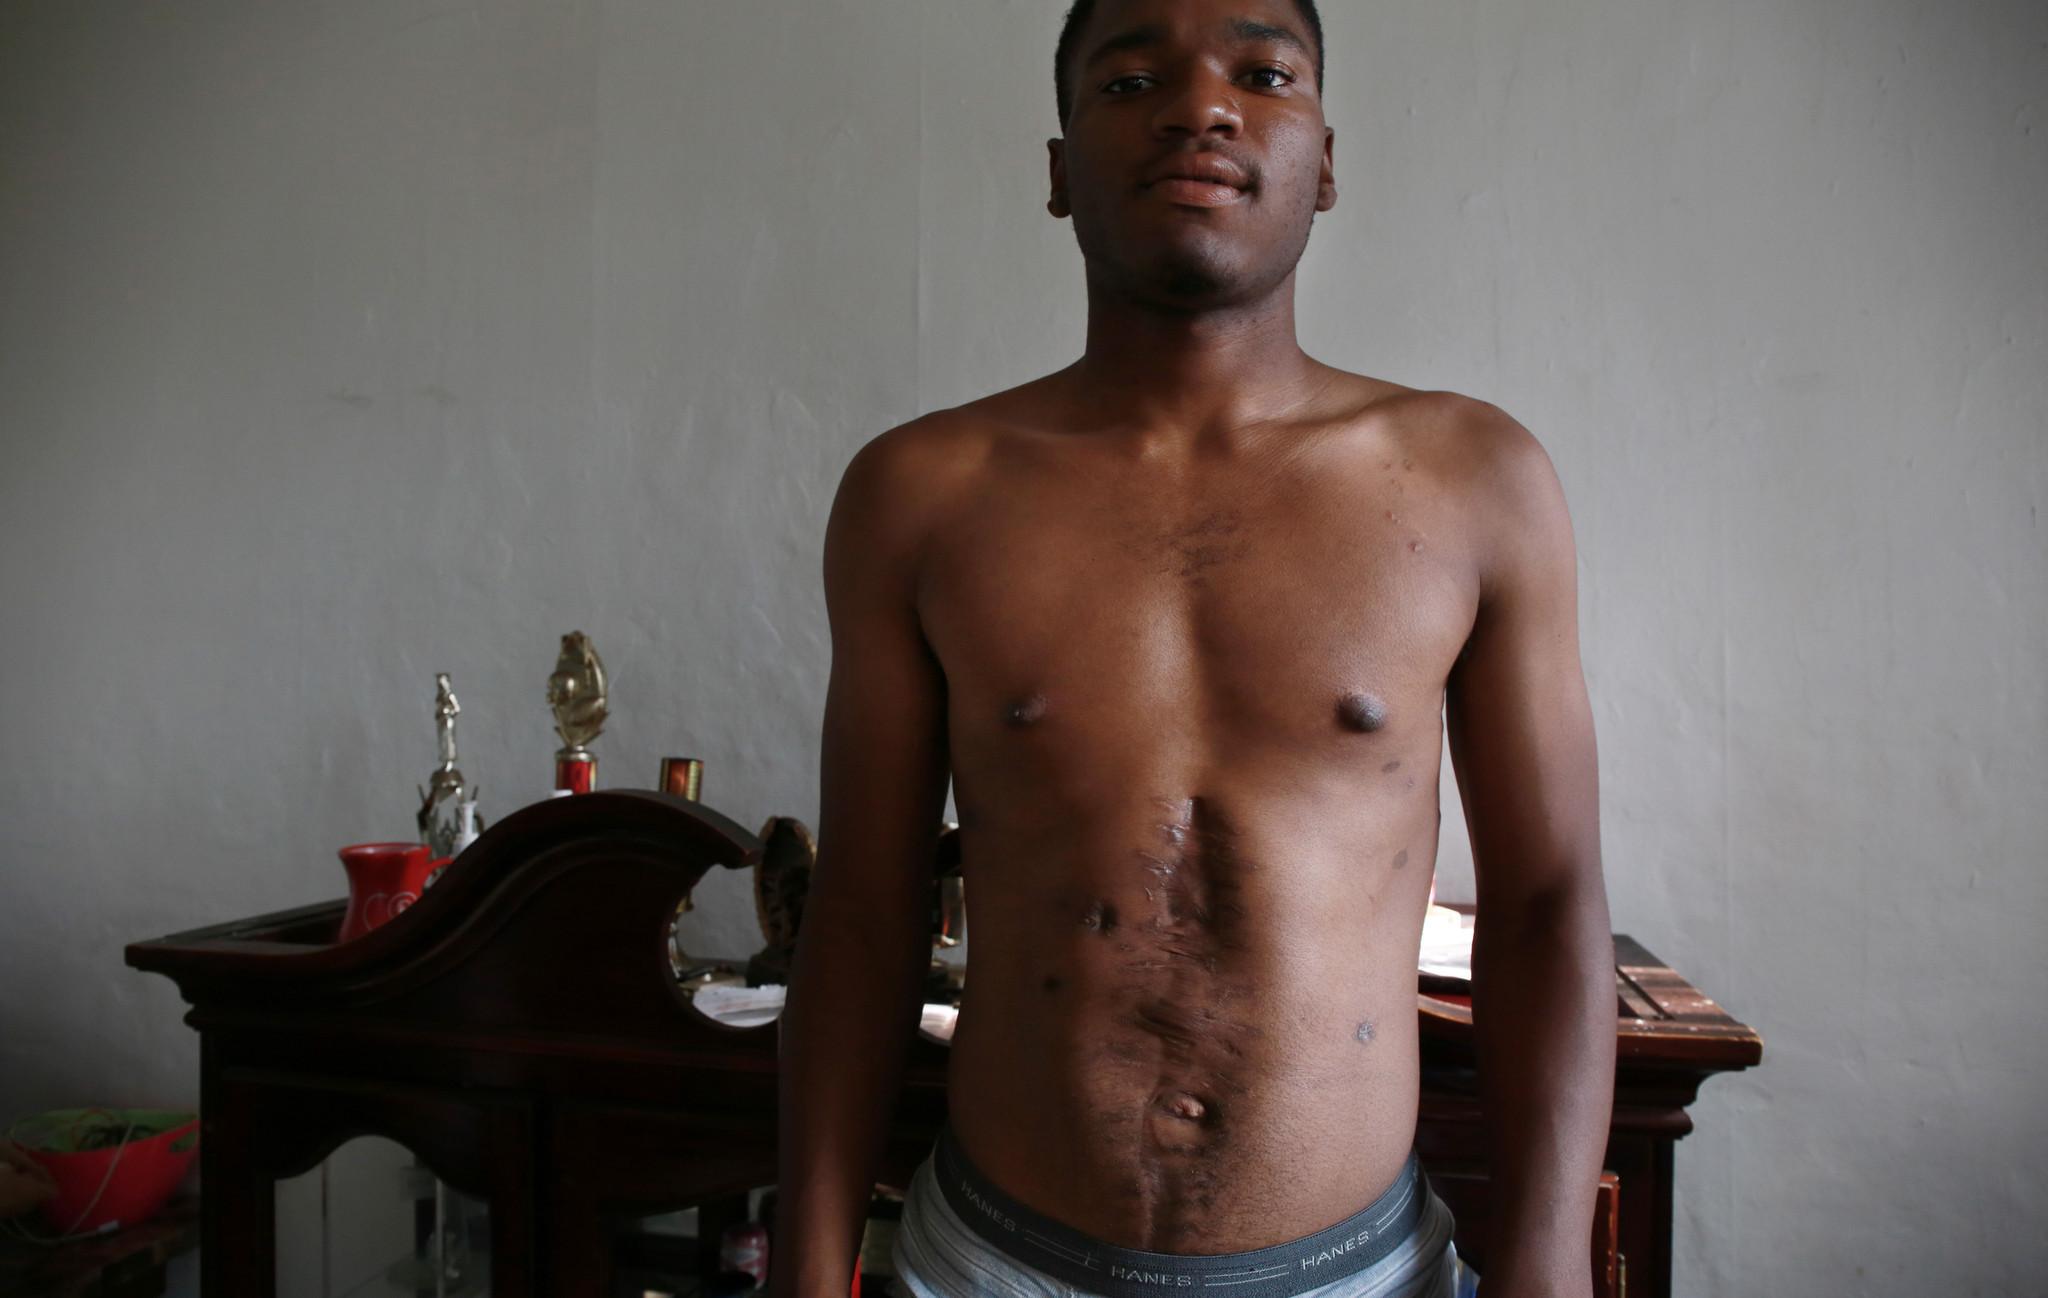 Jamal's scars